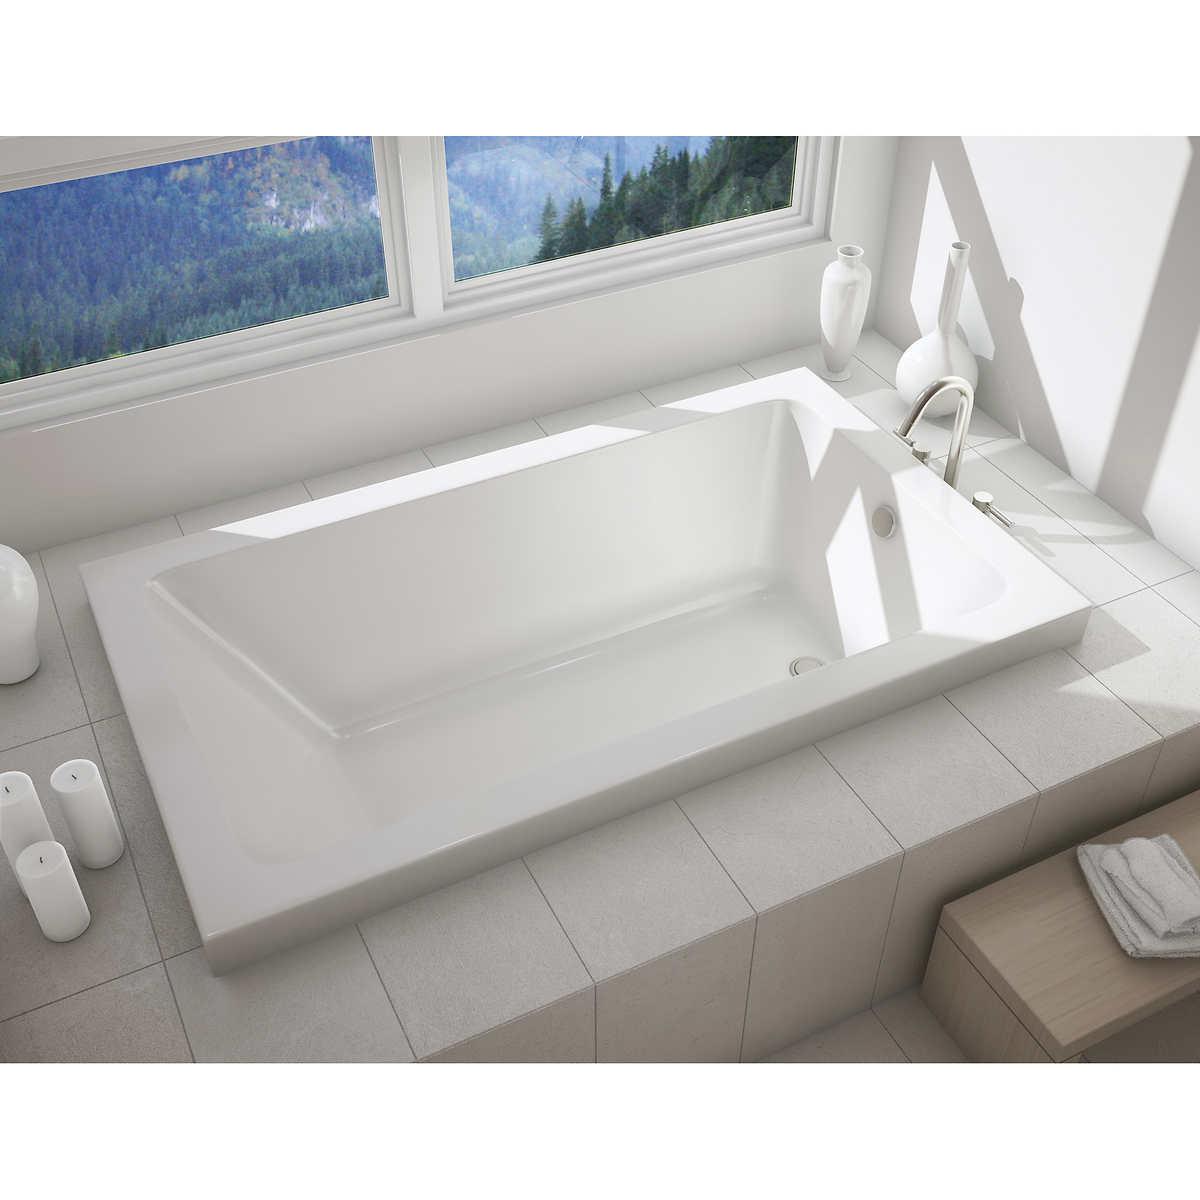 MAAX New Town Soaker 60 in. Bathtub - Left-hand Drain